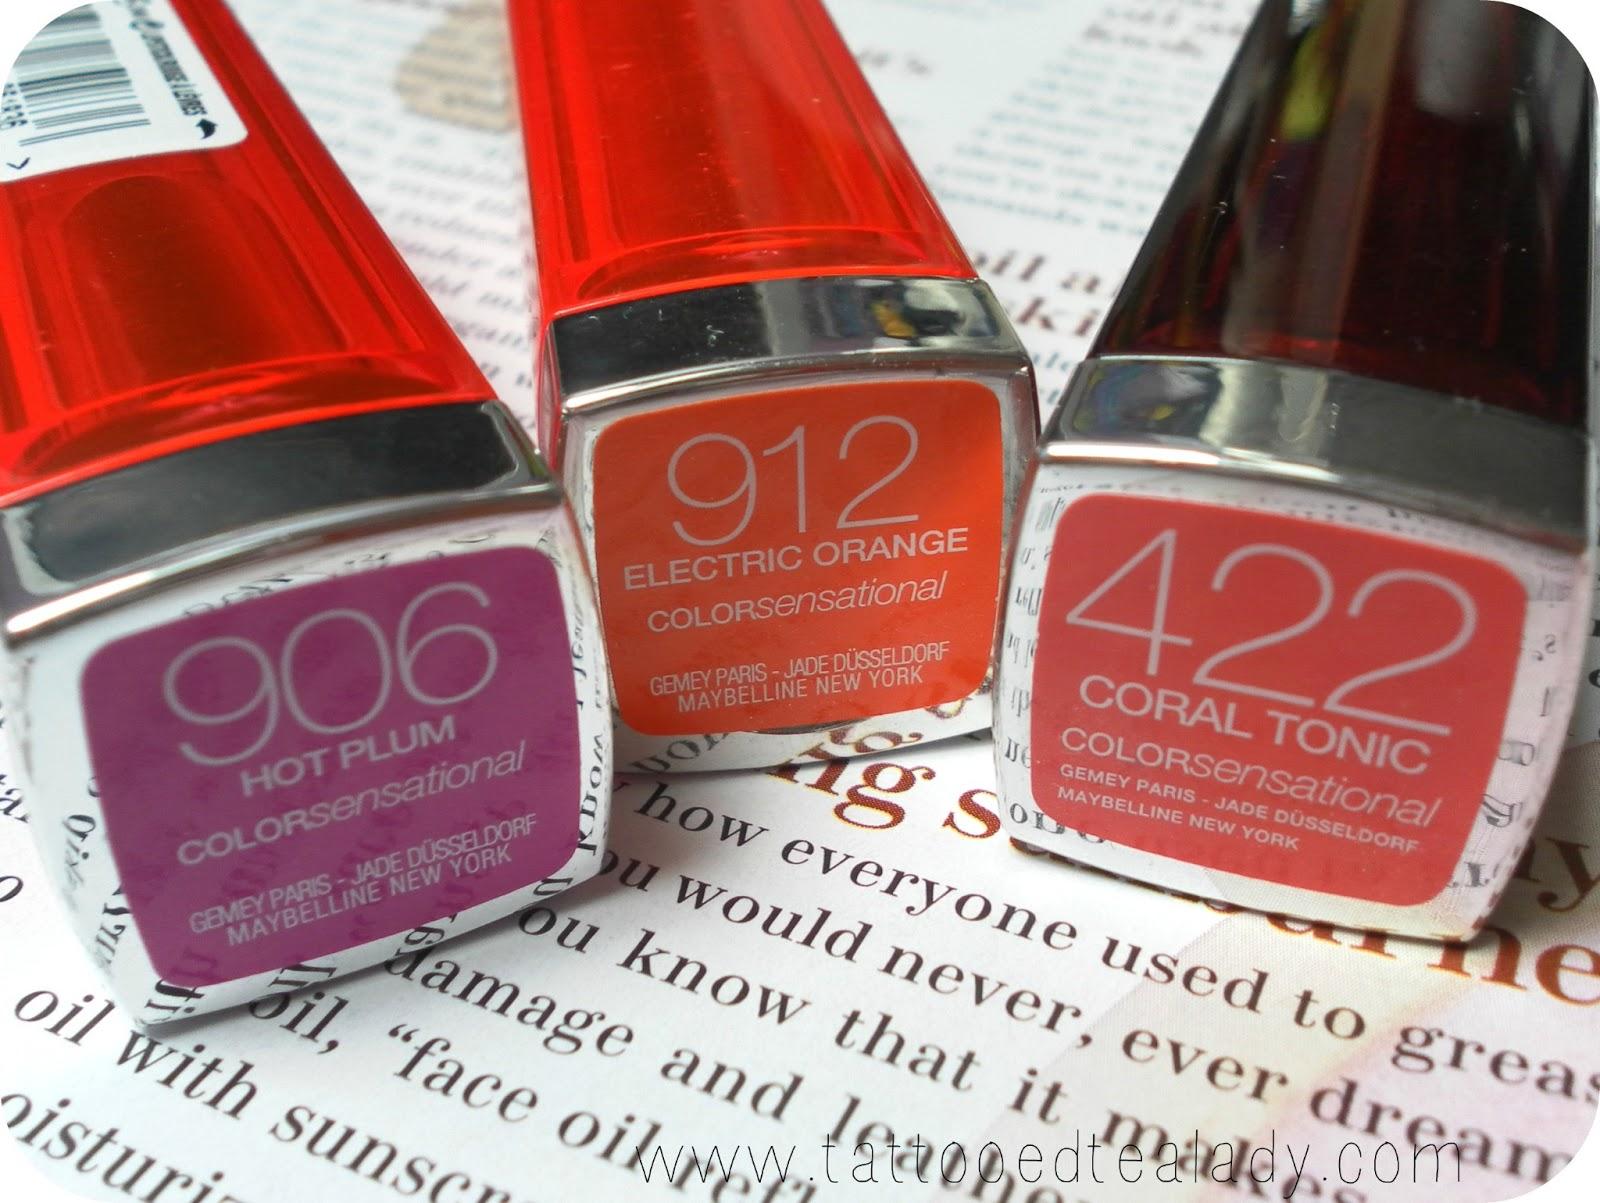 Favourite Drugstore Lipsticks - MAC dupes - Tattooed Tealady